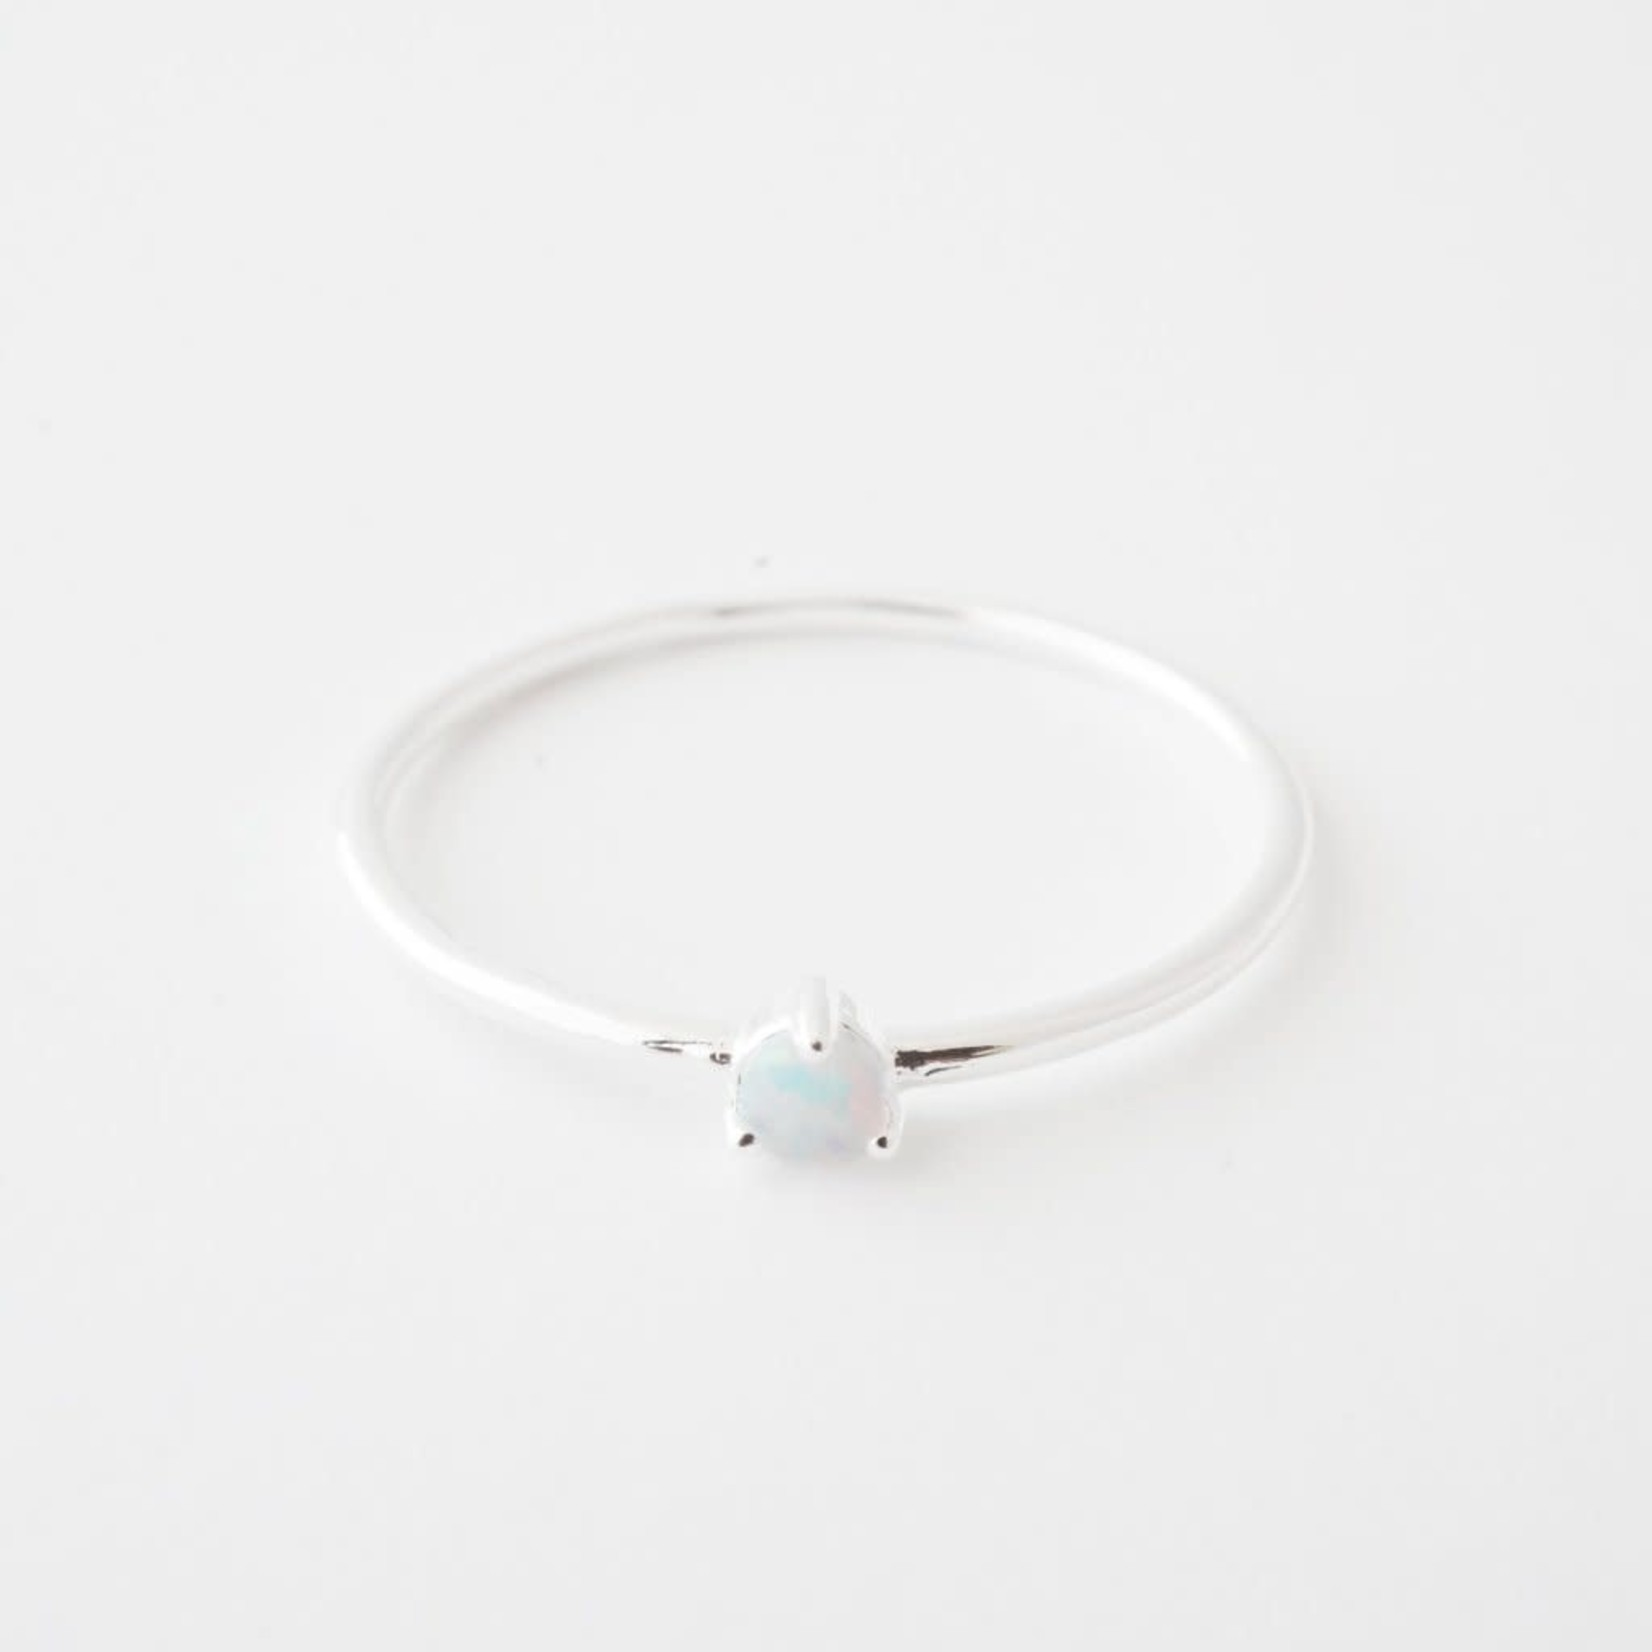 Honeycat Jewelry Honeycat Orb Ring Opal Silver